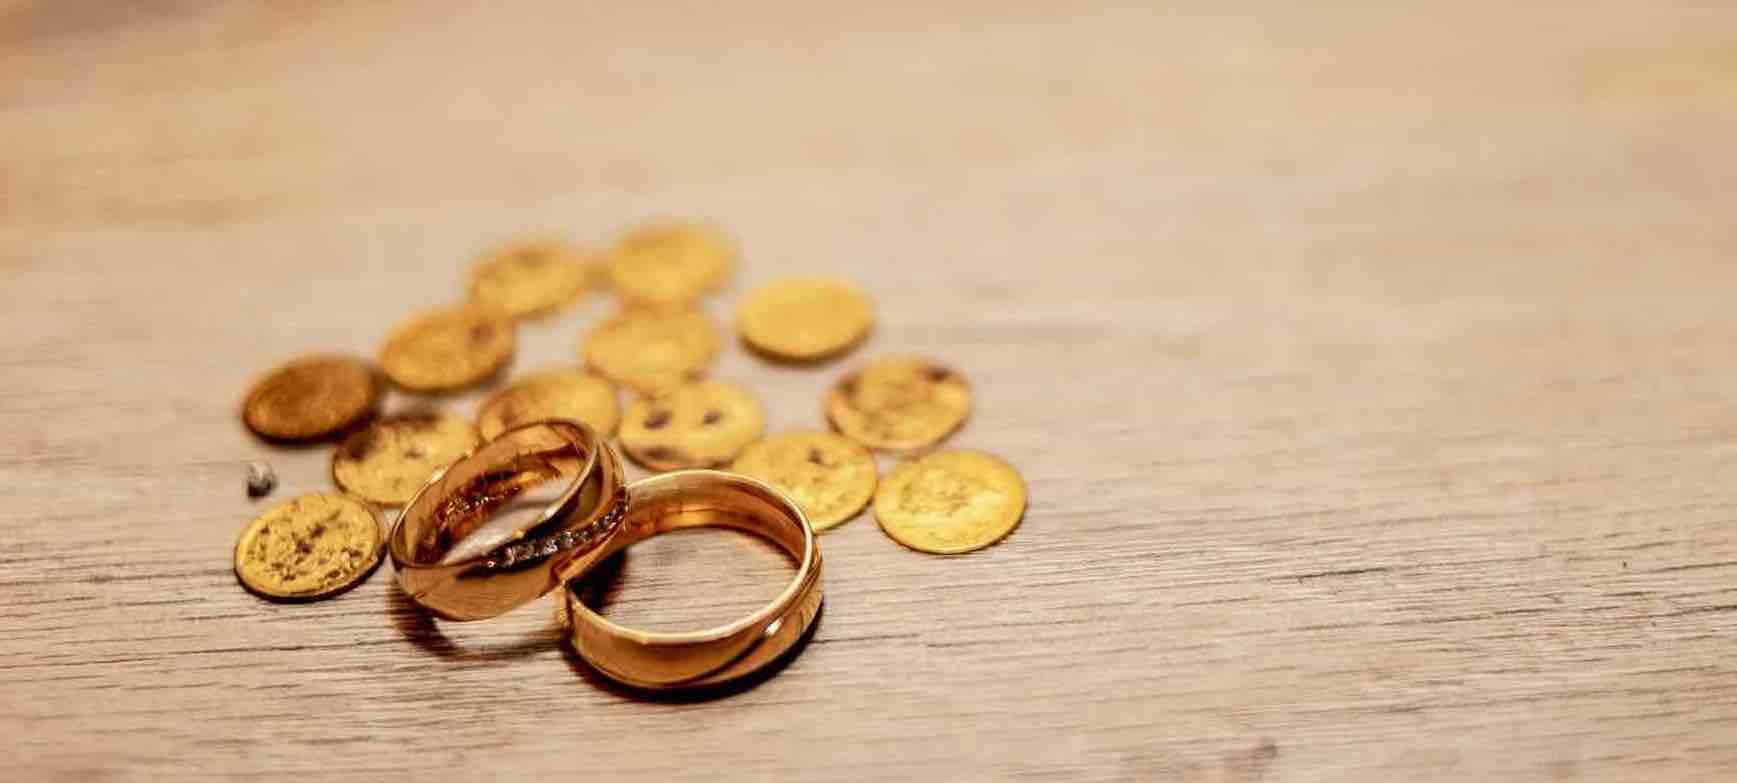 rachat or bijoux déchet or